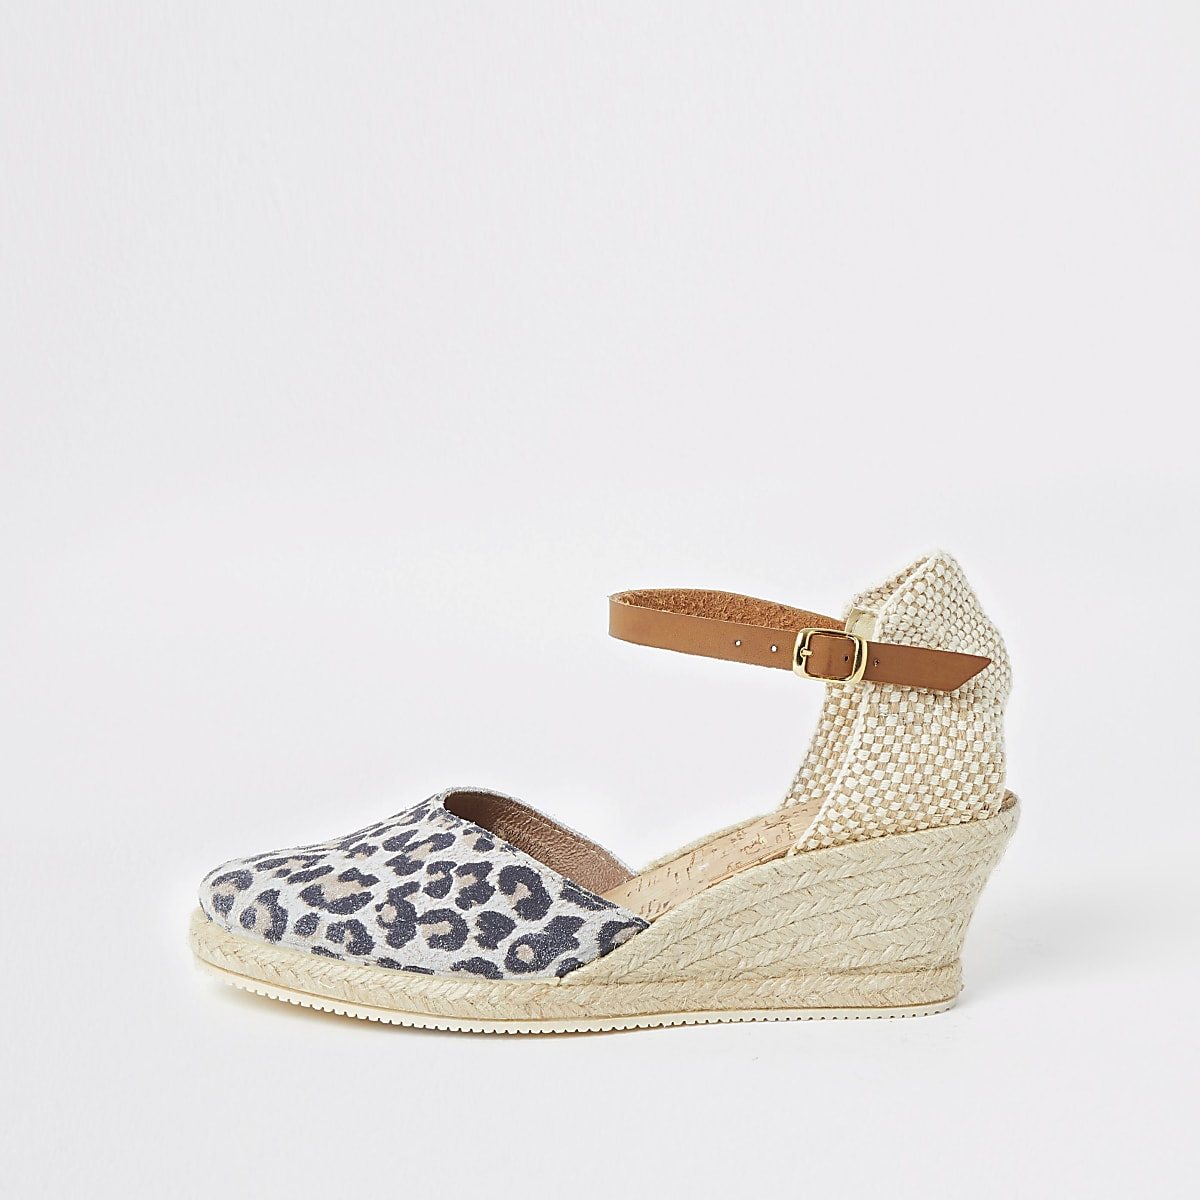 cff0a8fae Ravel brown leopard print espadrille wedges - Sandals - Shoes & Boots -  women